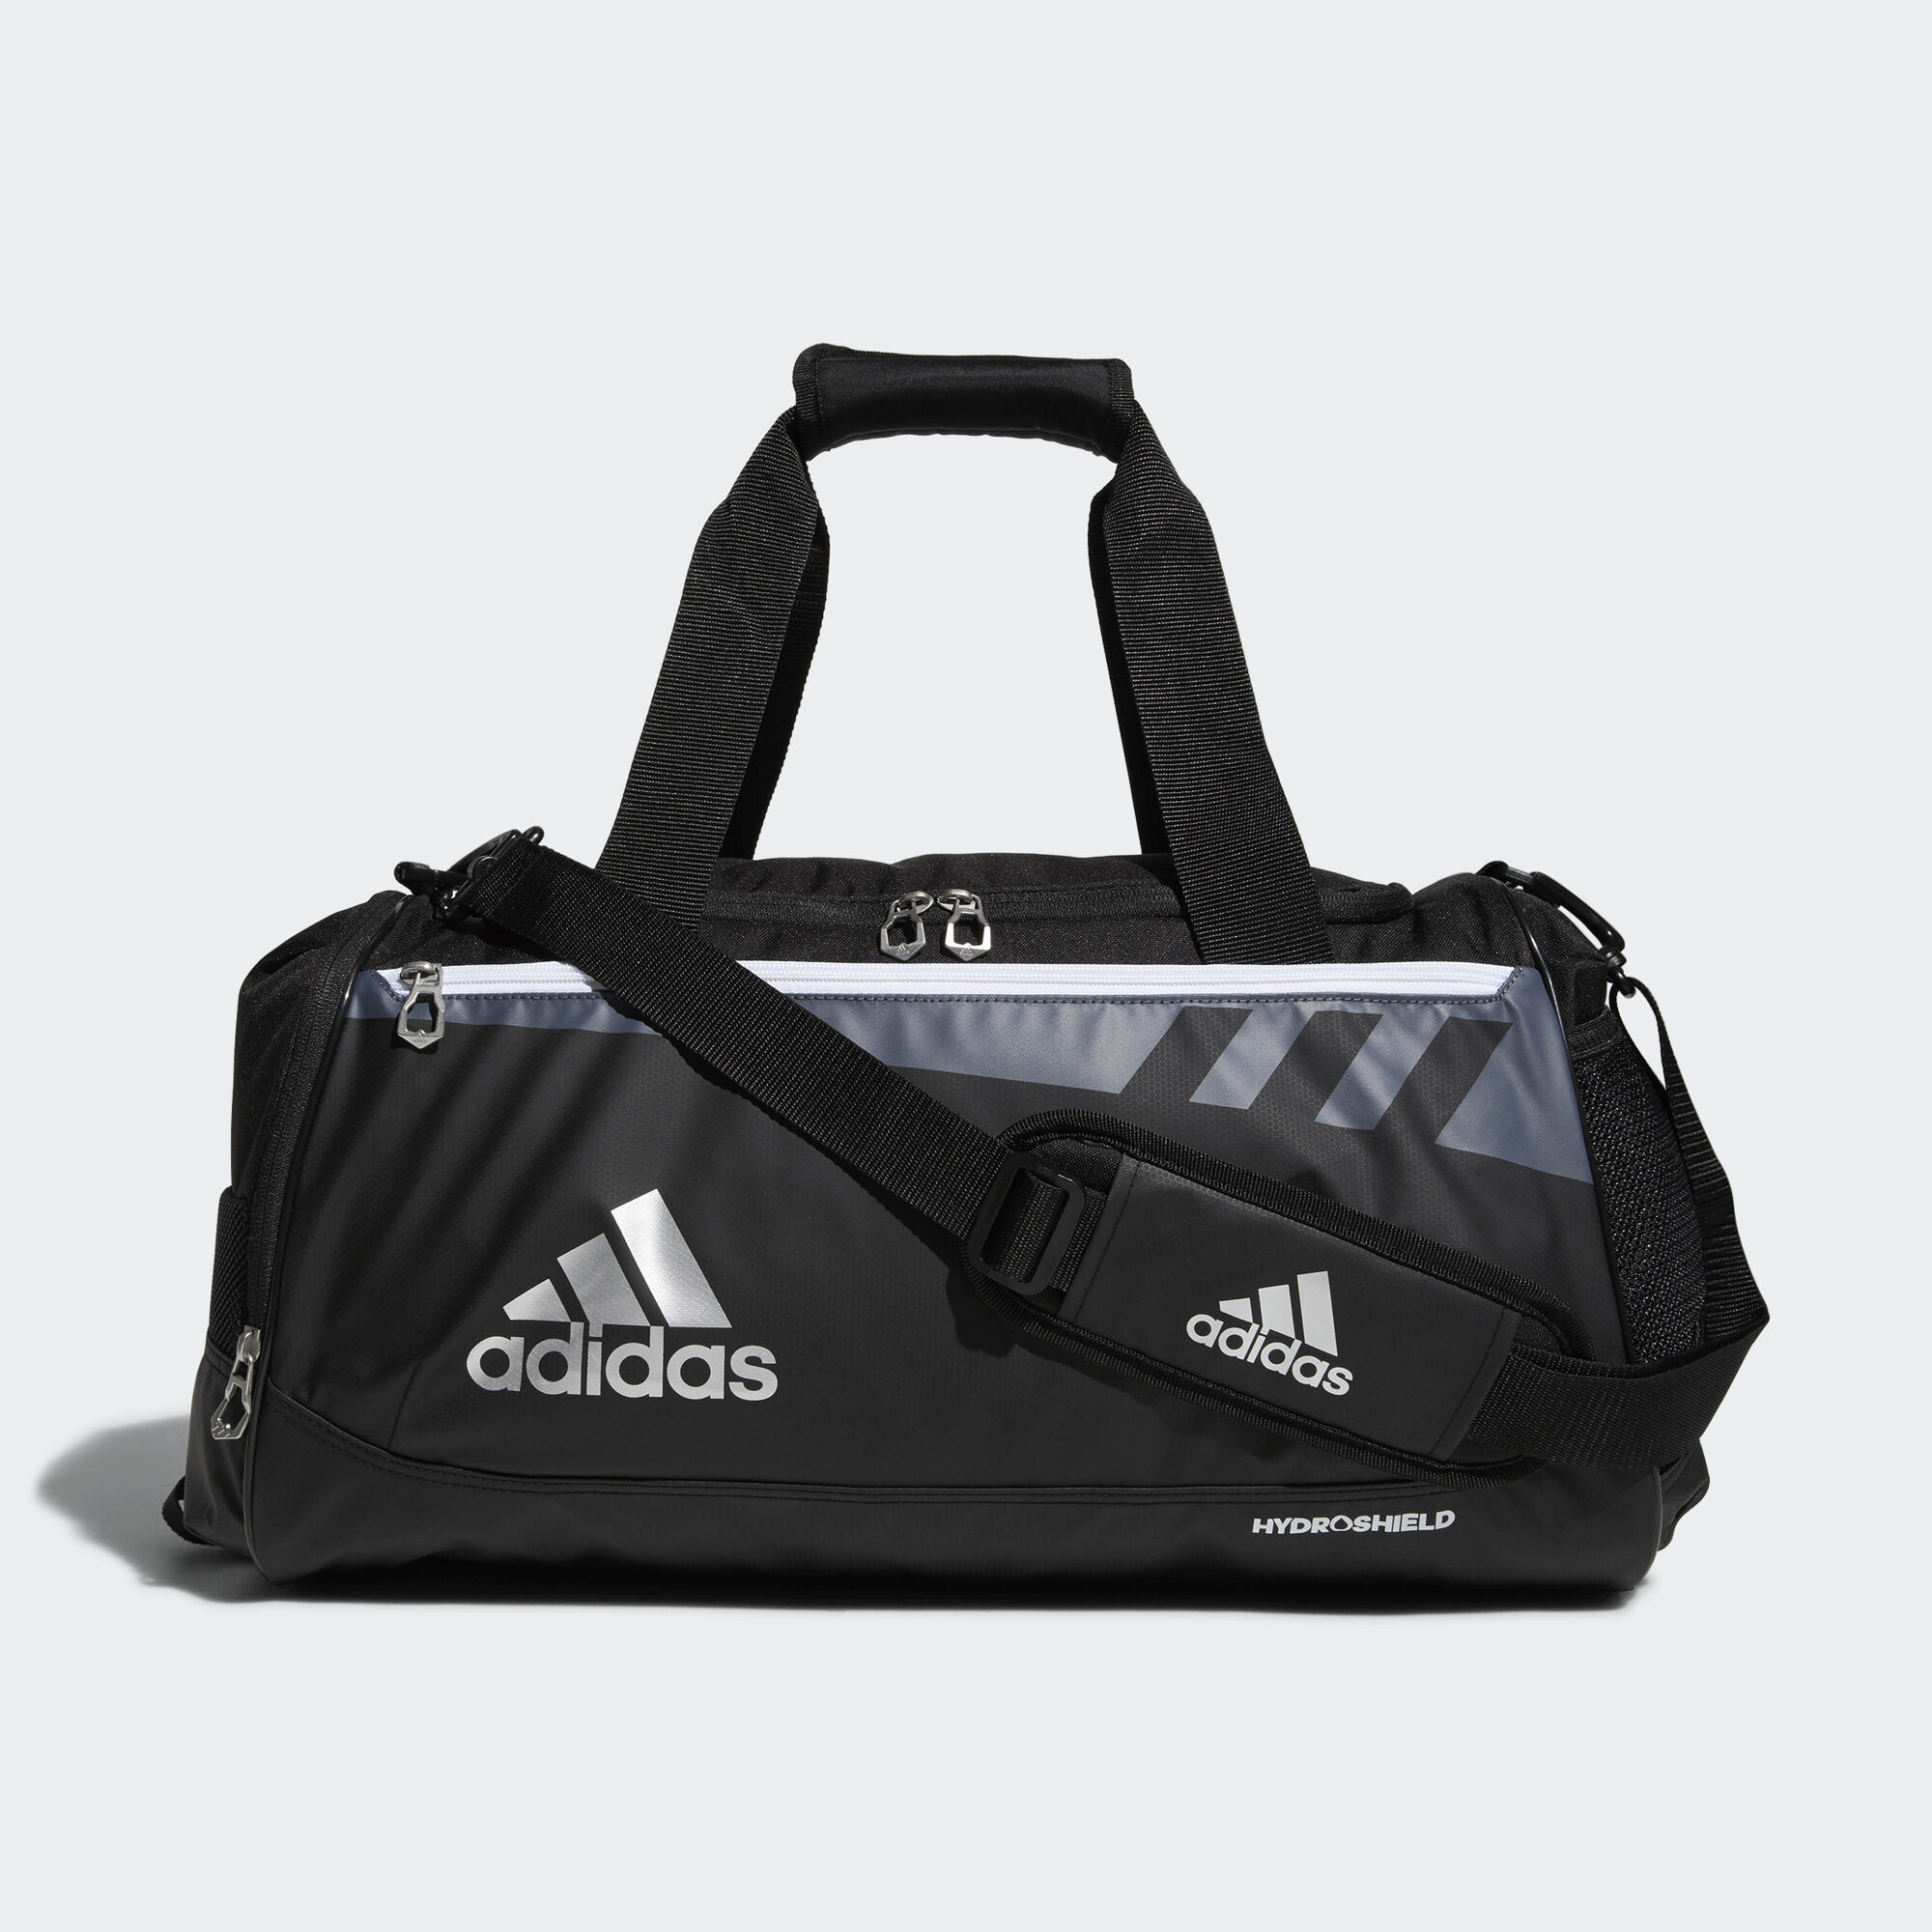 24974cdb0fab Buy small adidas duffle bag   OFF67% Discounted